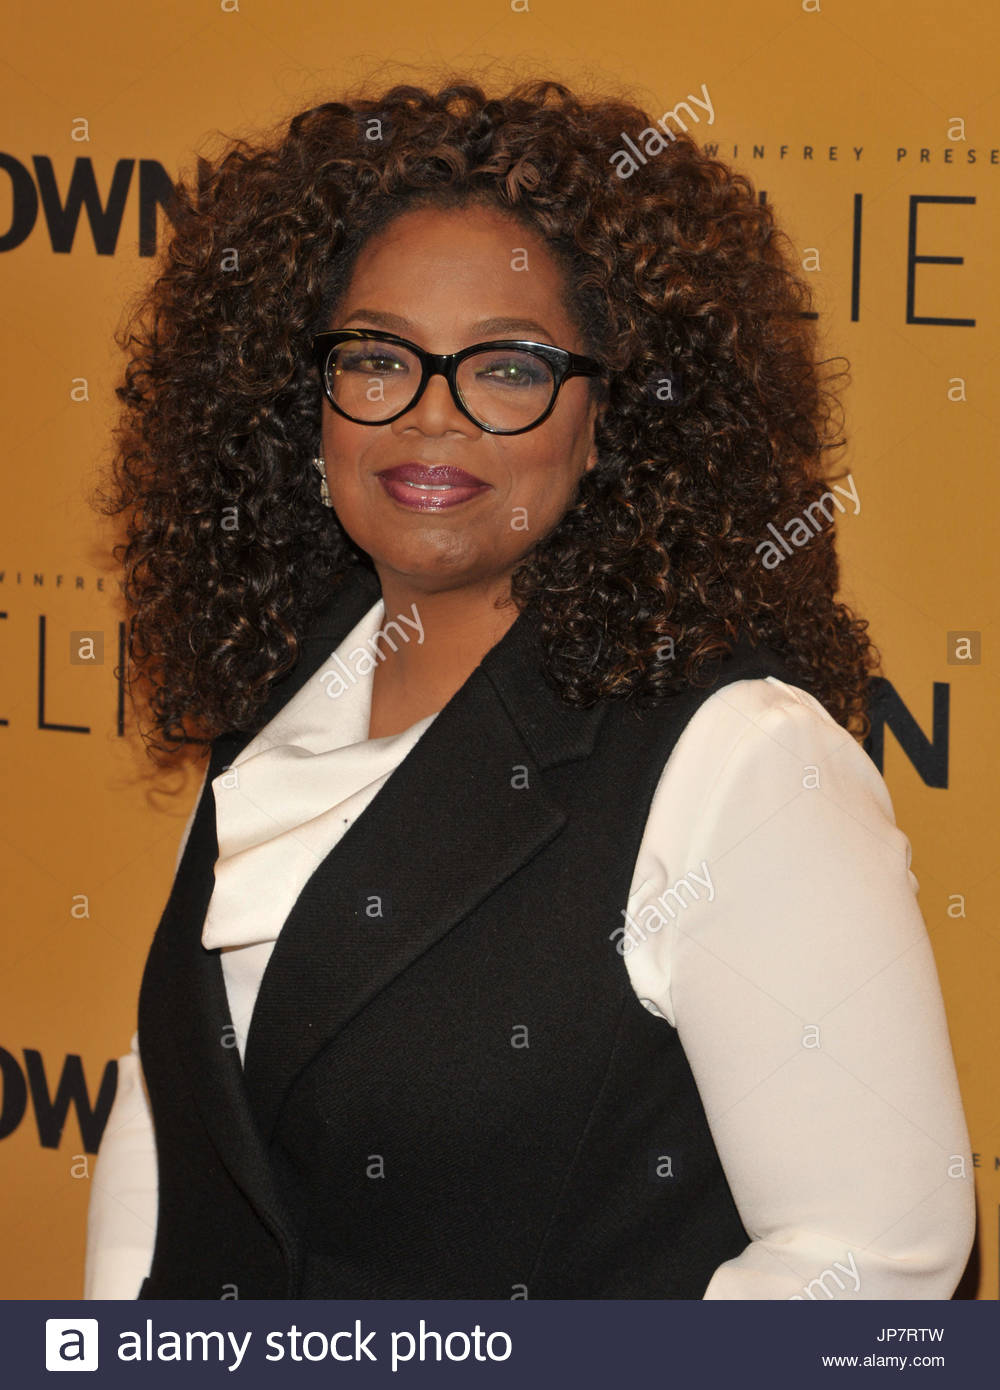 images 14. Oprah